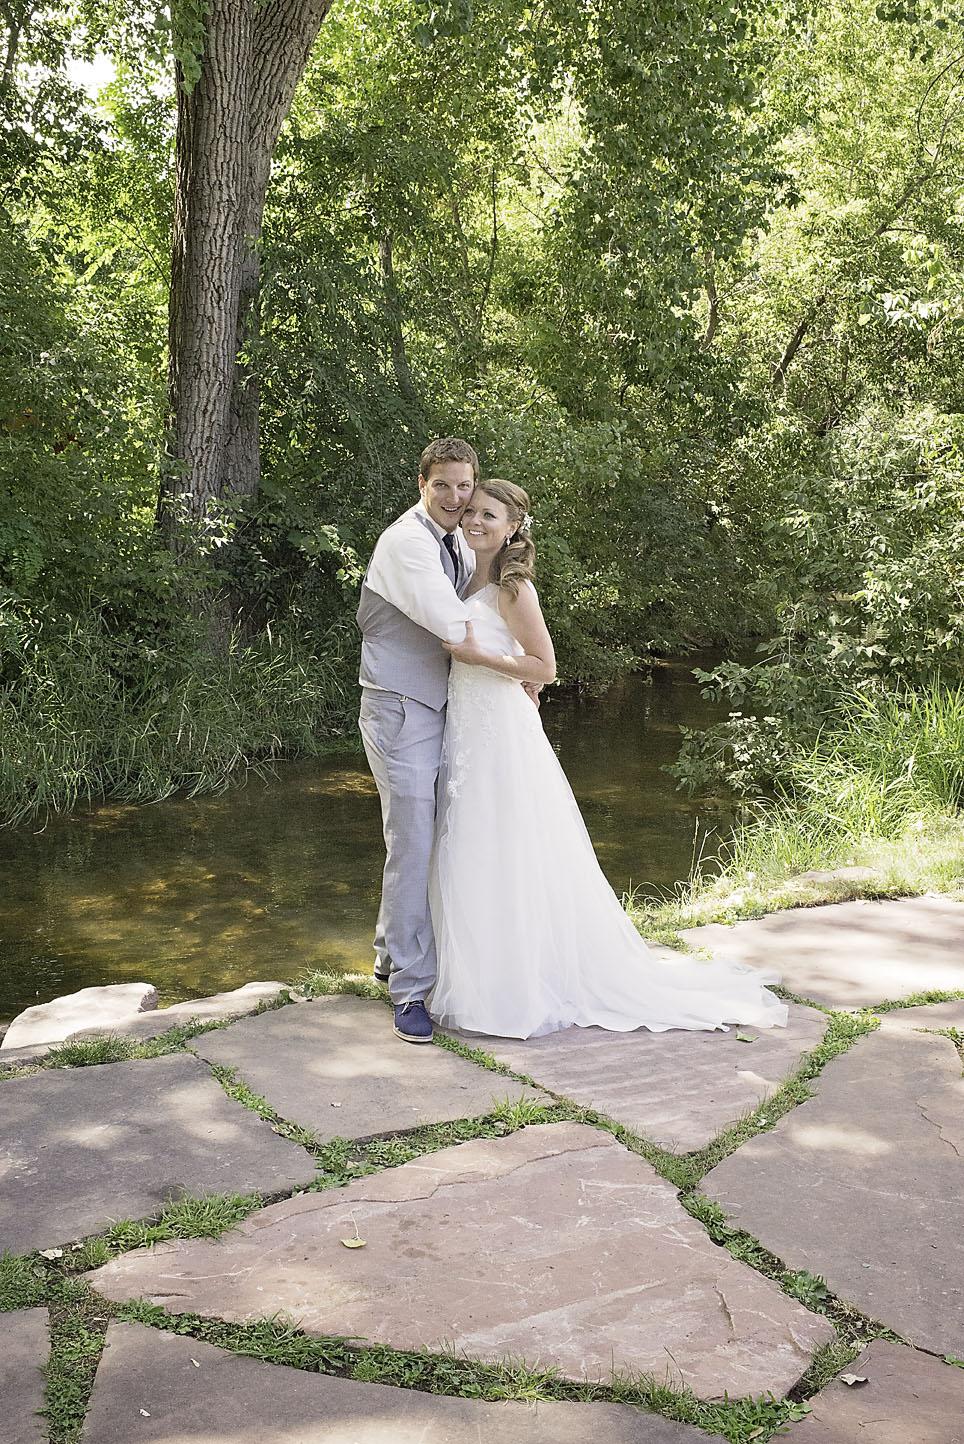 devorahroldan- Web Powell Wedding First Look-17 copy.jpg